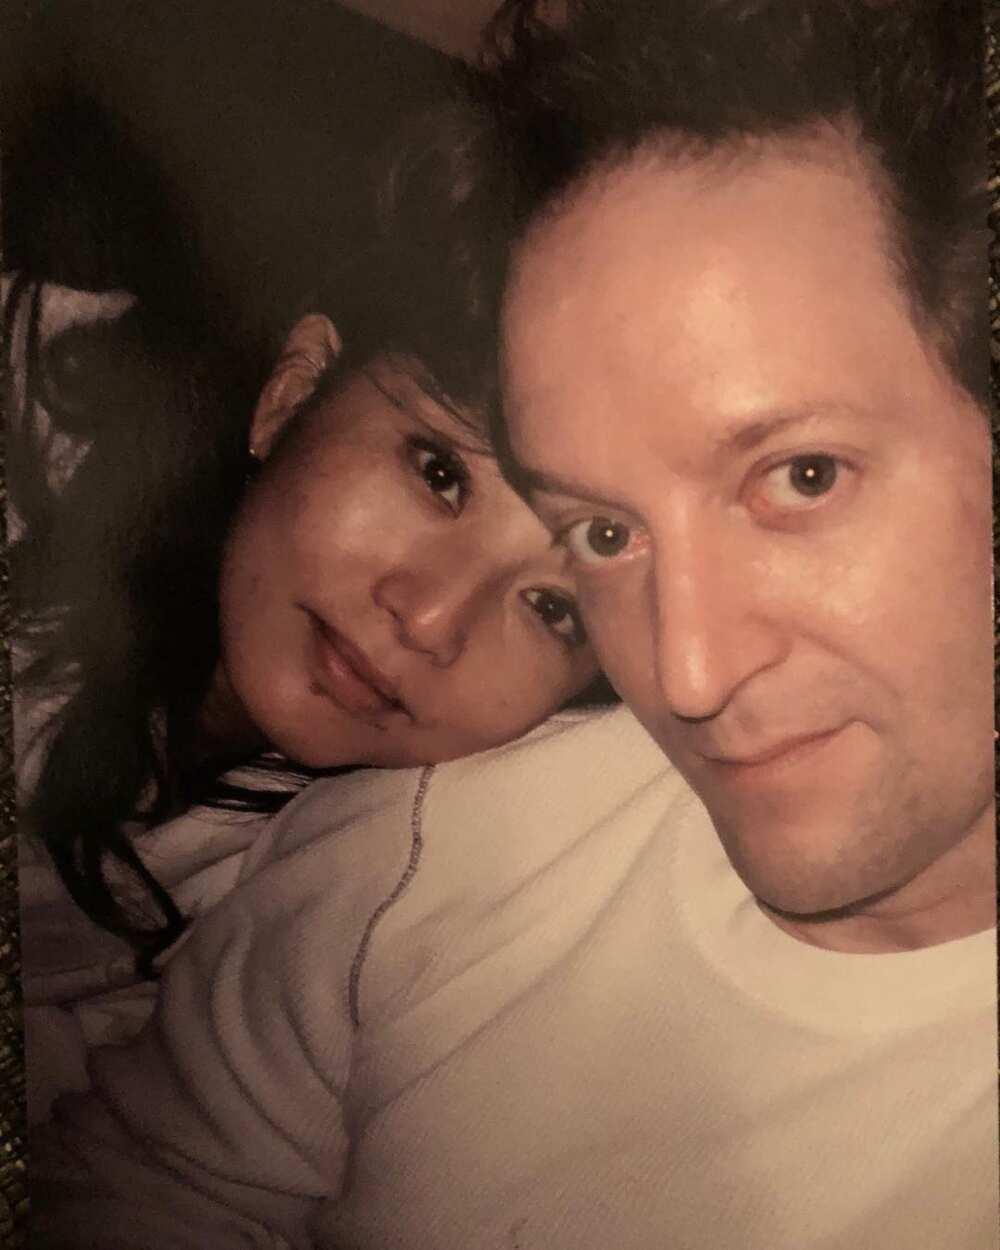 Tamlyn Tomita with her man